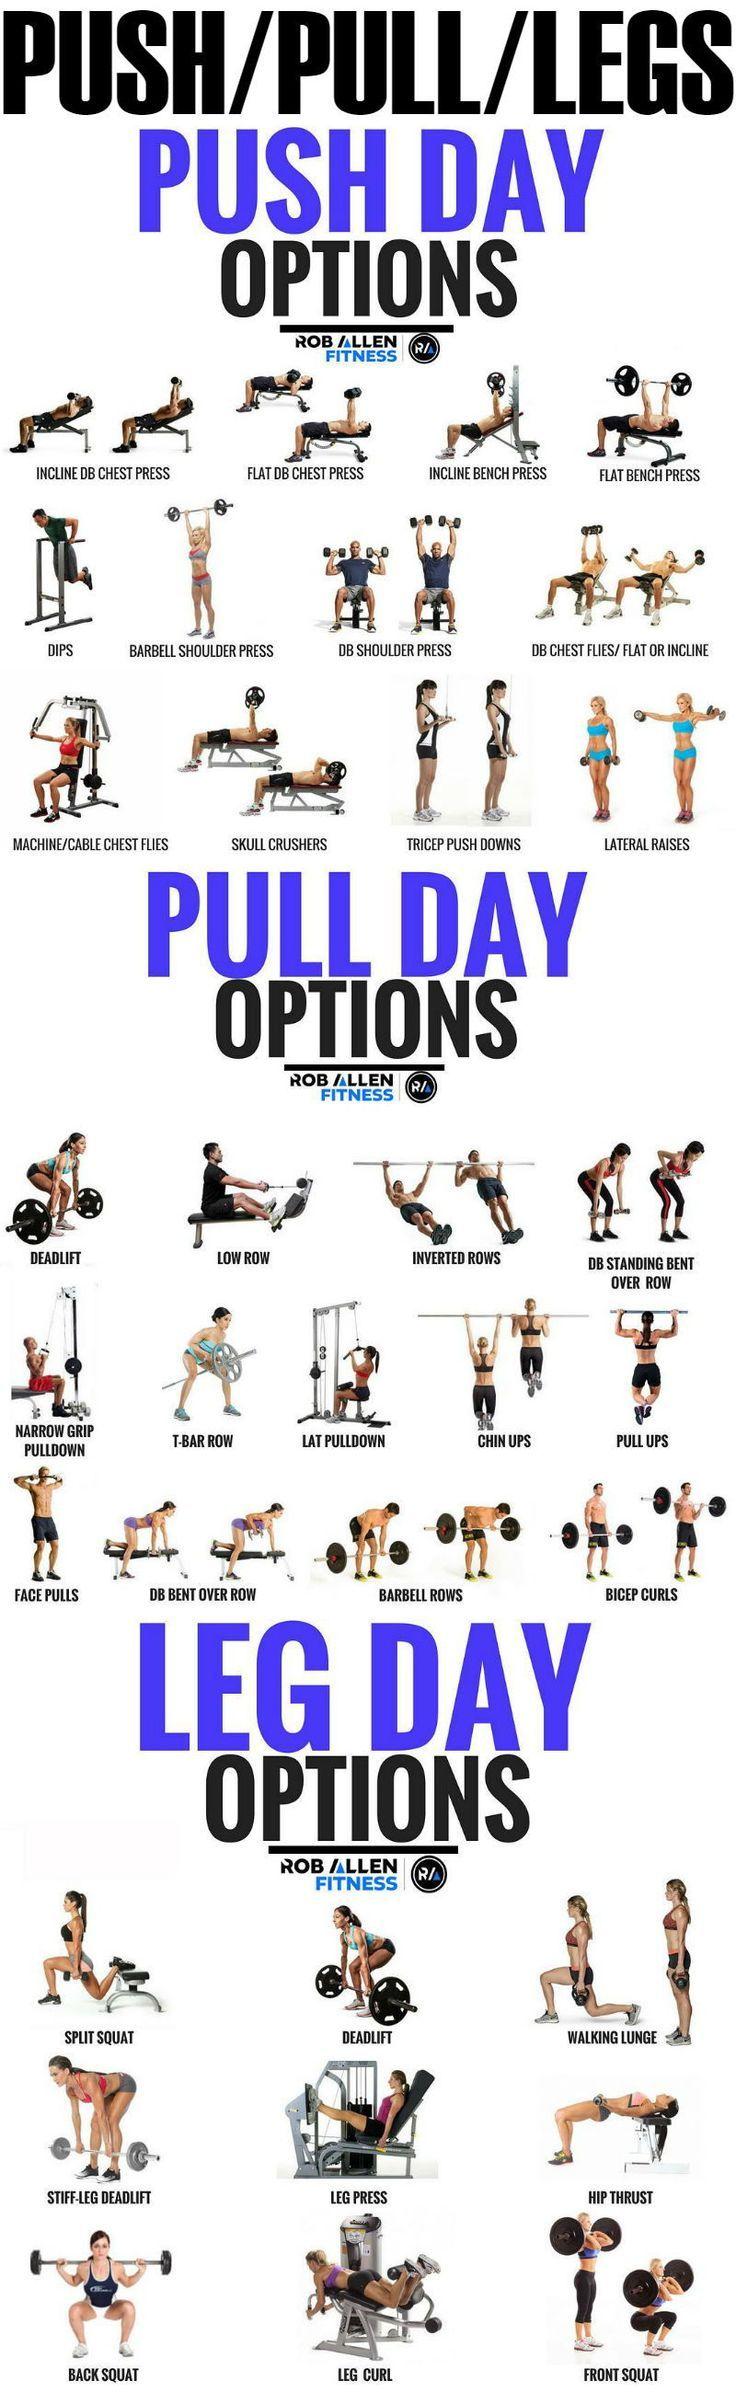 Push/Pull/Legs Weight Training Workout Schedule For 7 Days - GymGuider.com #weighttraining